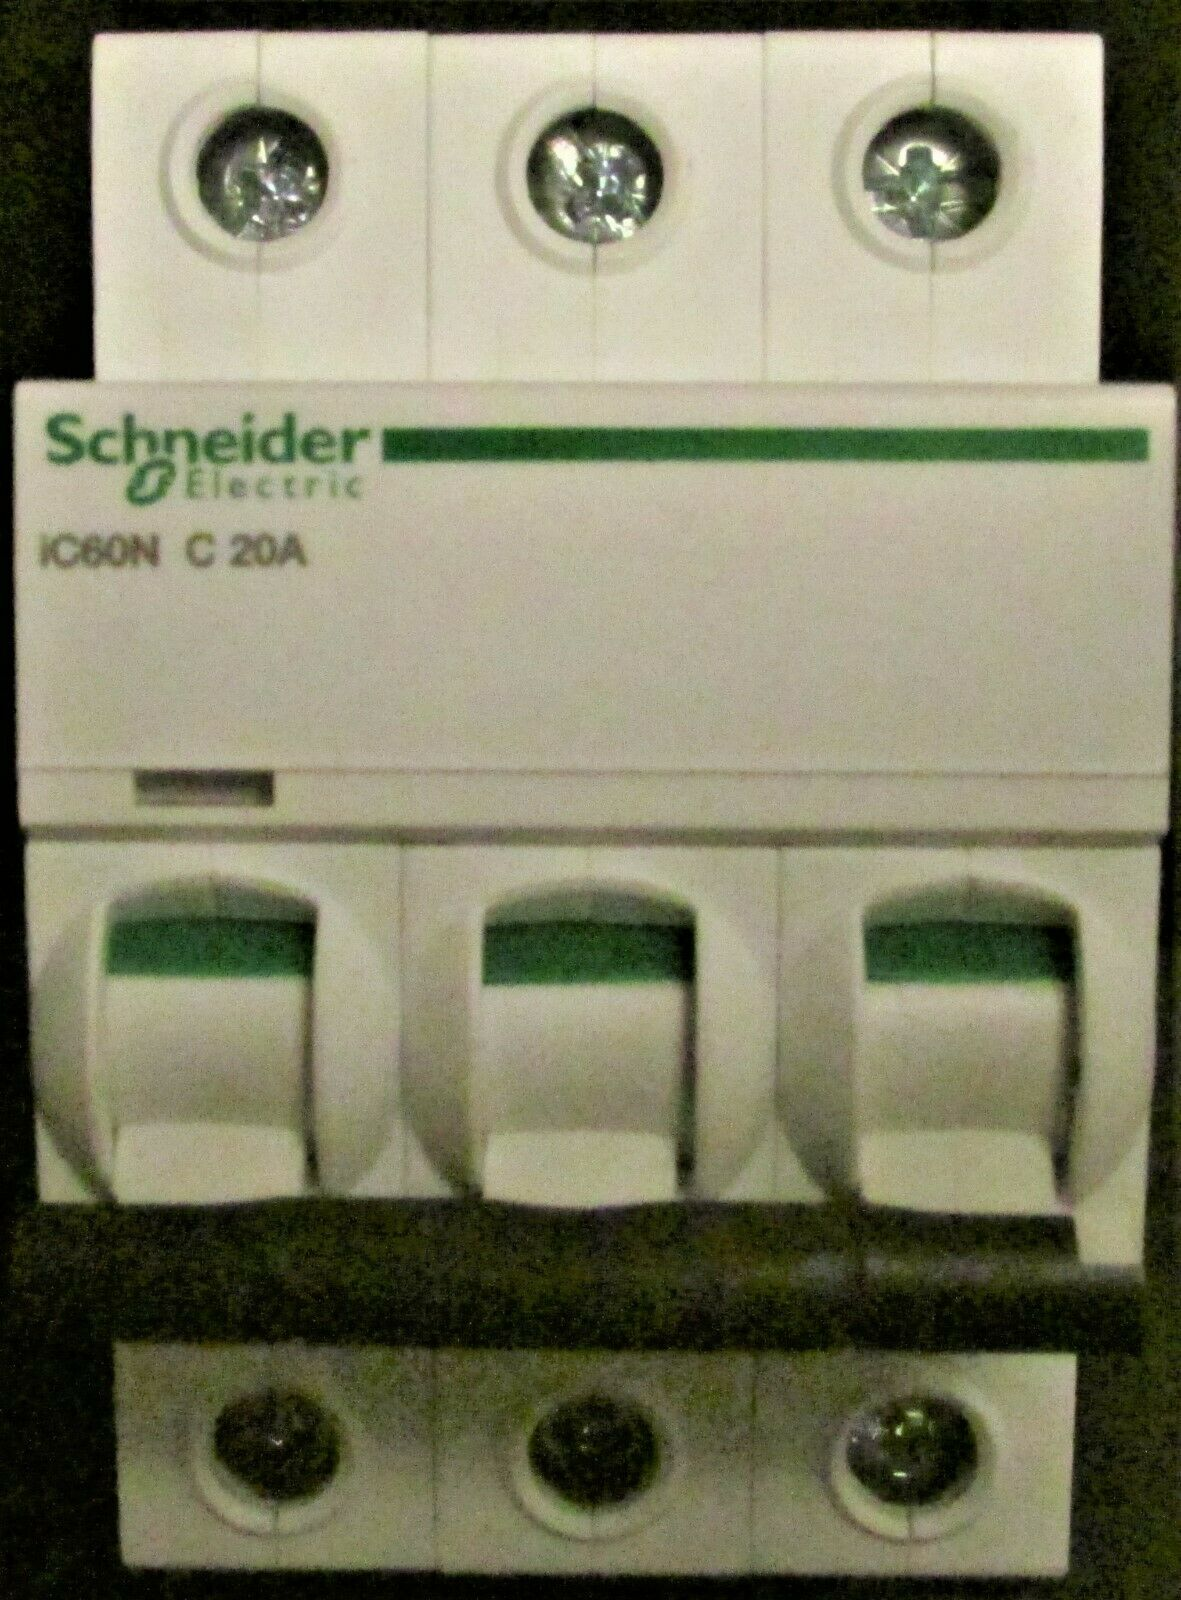 Schnieder IC60H C 50A Triple Pole Circuit Breaker